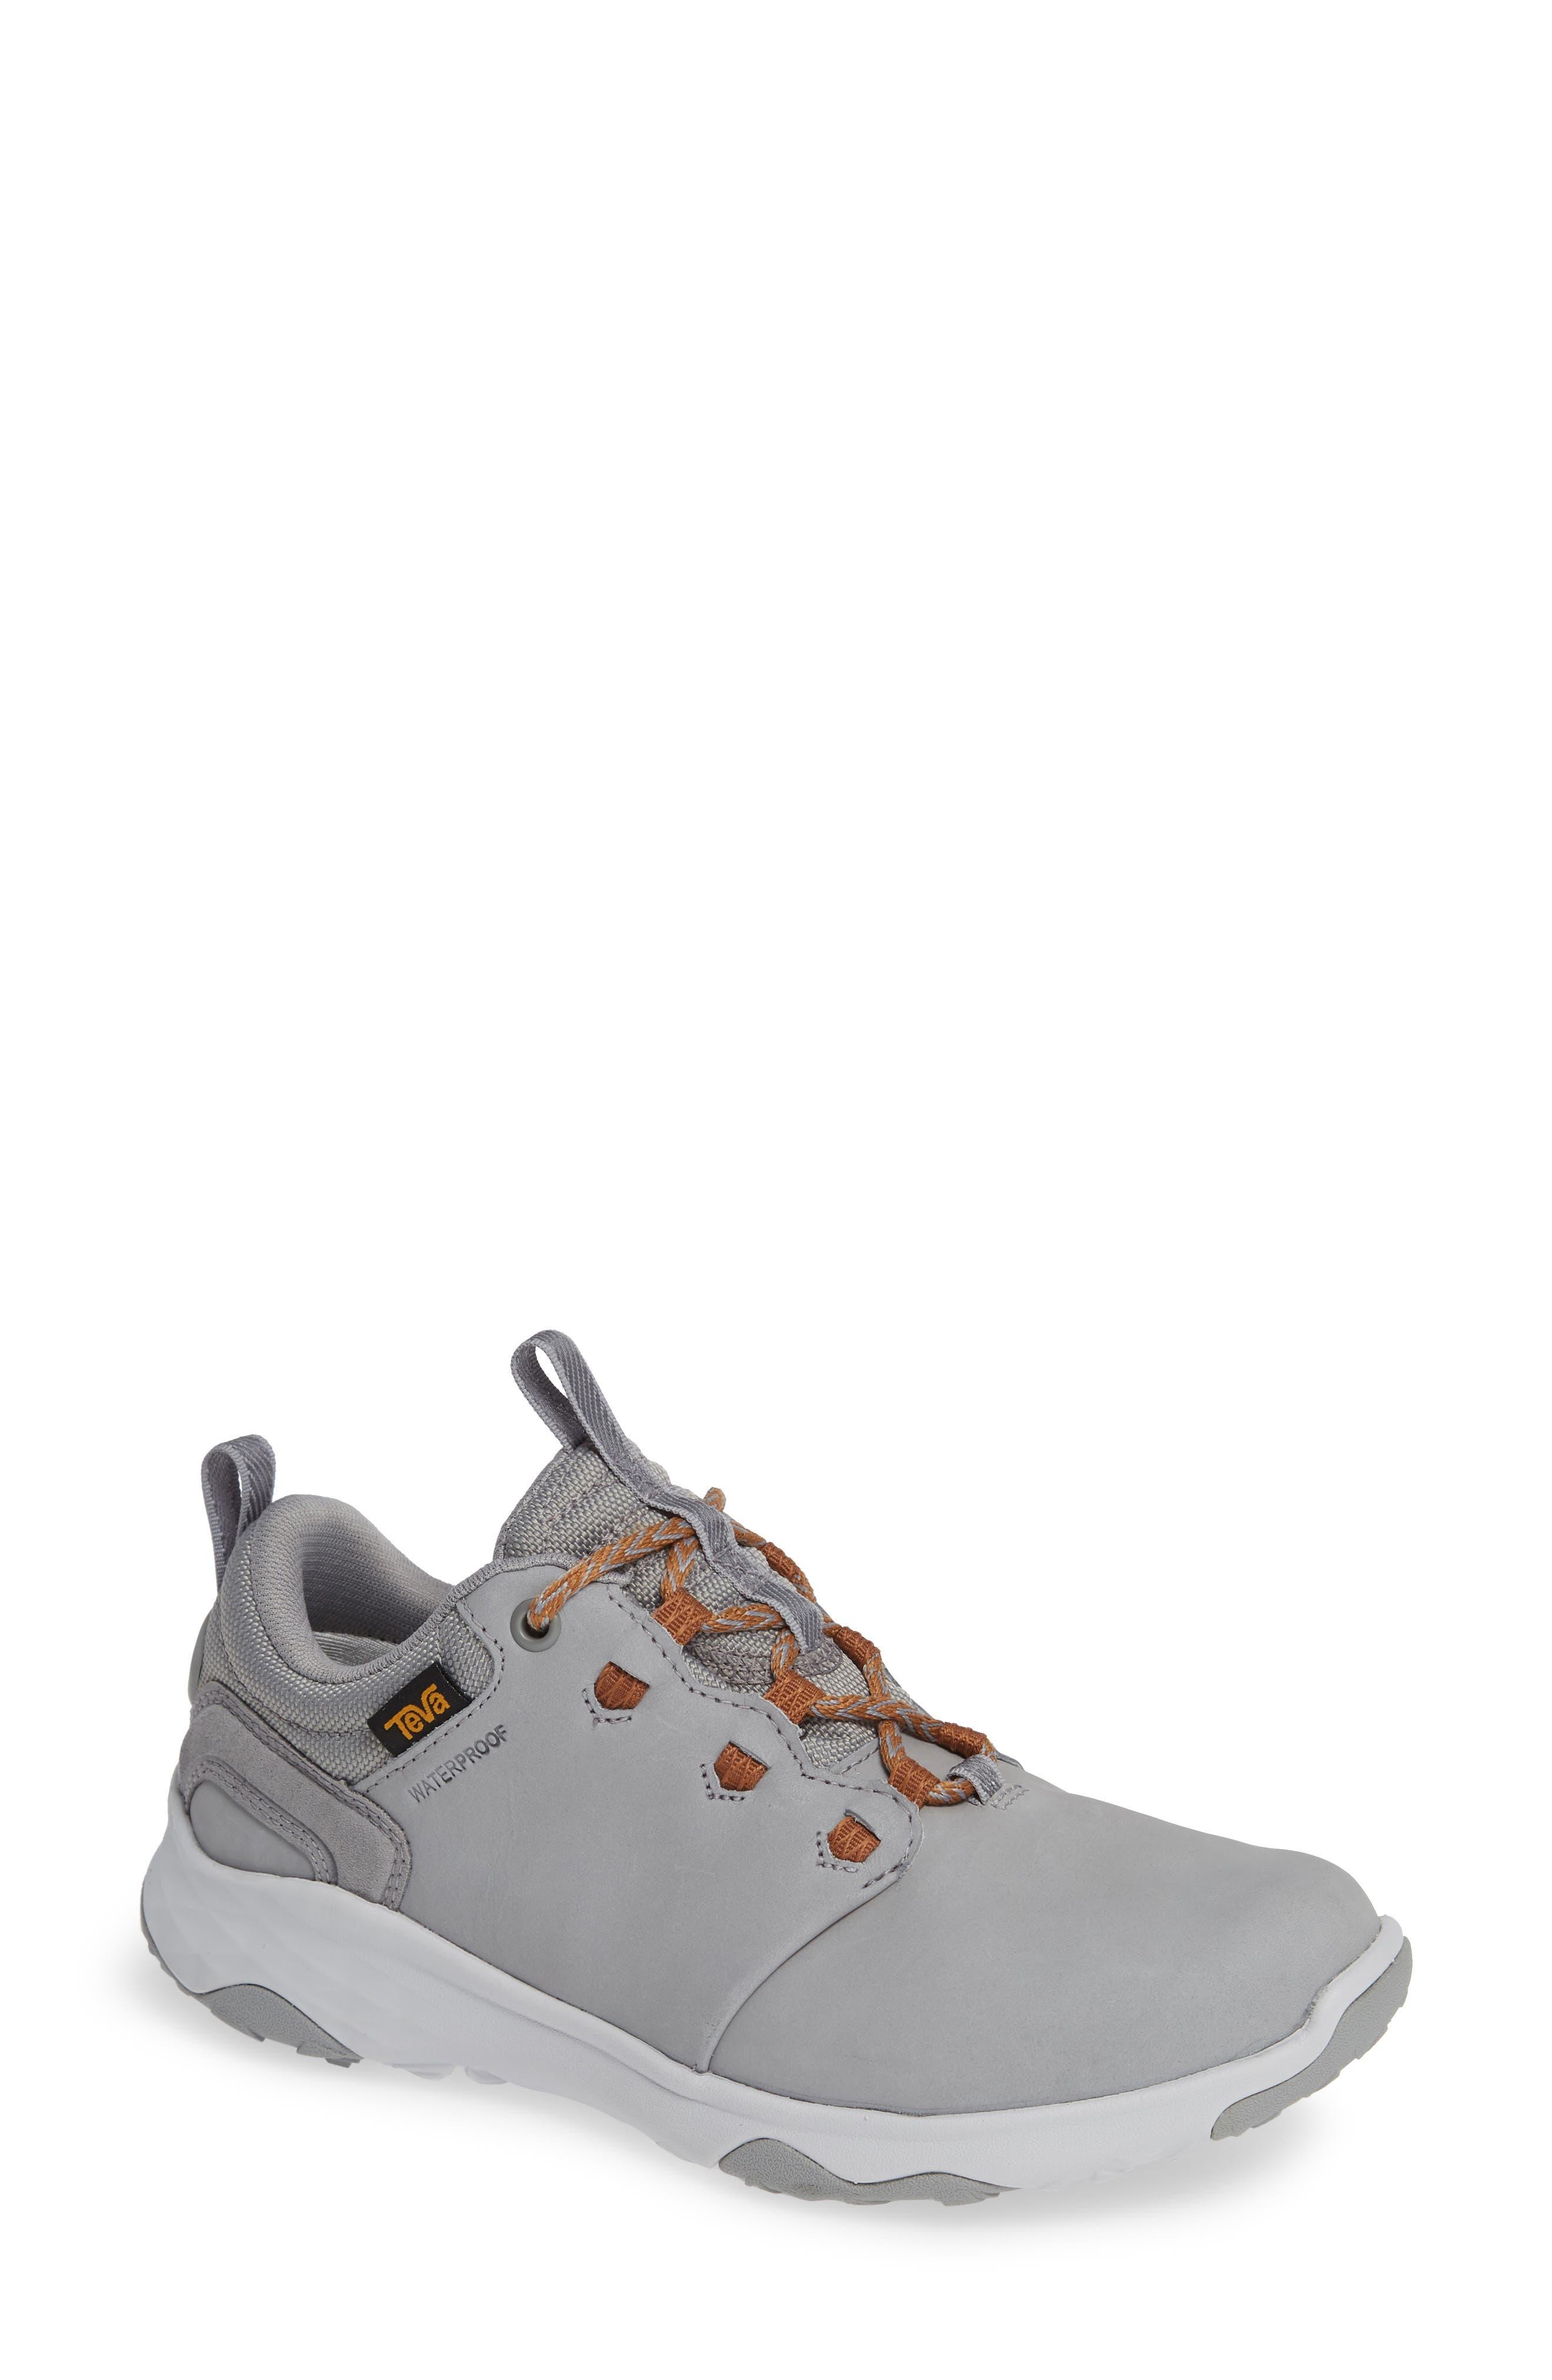 TEVA, 'Arrowood' Waterproof Sneaker, Main thumbnail 1, color, WILD DOVE LEATHER